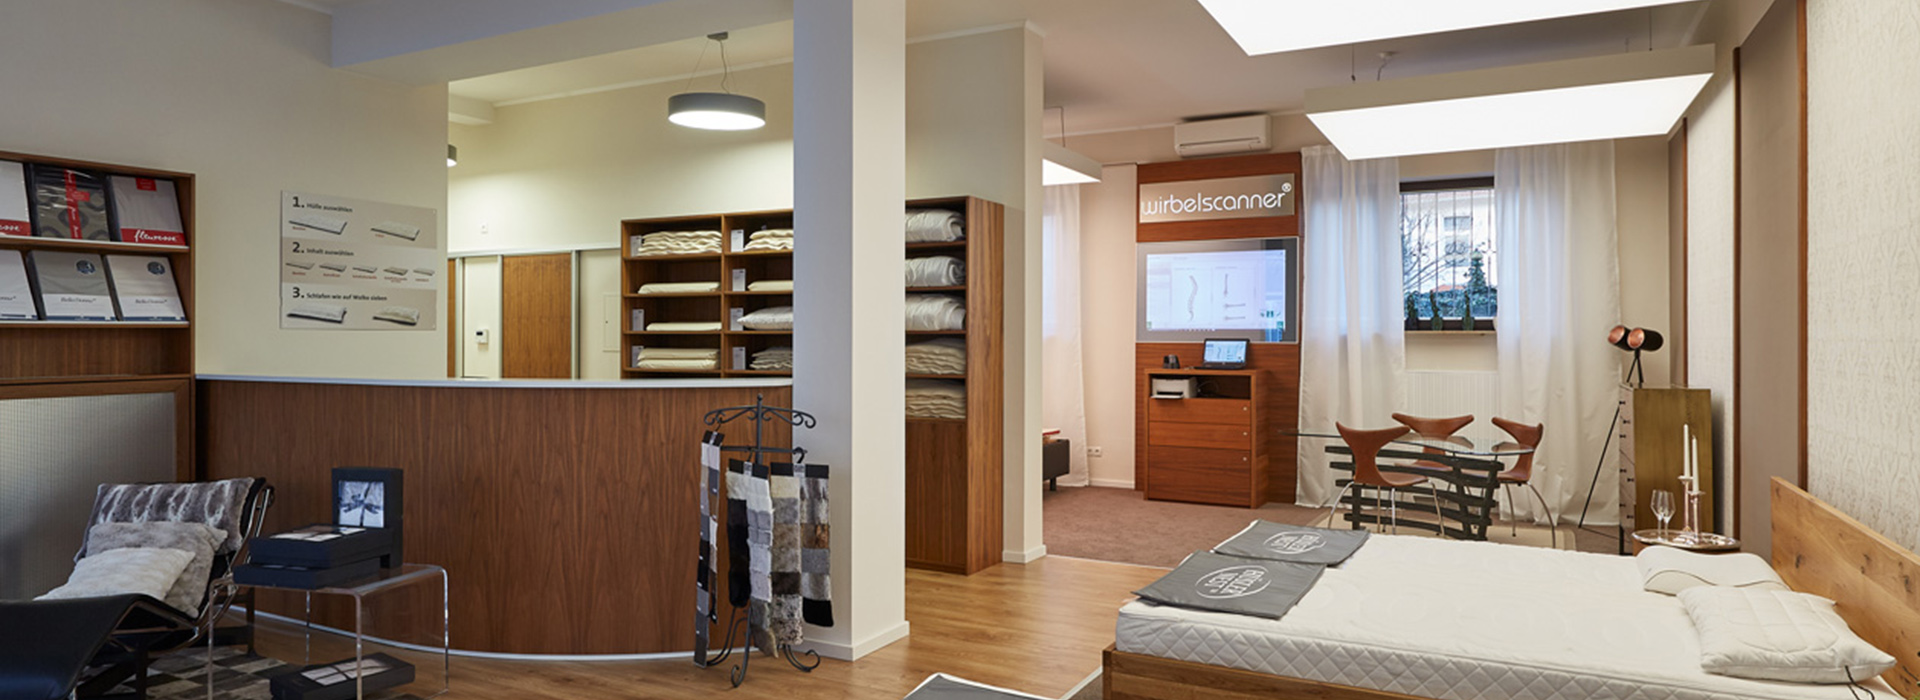 Filiale Landau - Schlafberatung-zu-Hause-Bettenhaus-Horsch